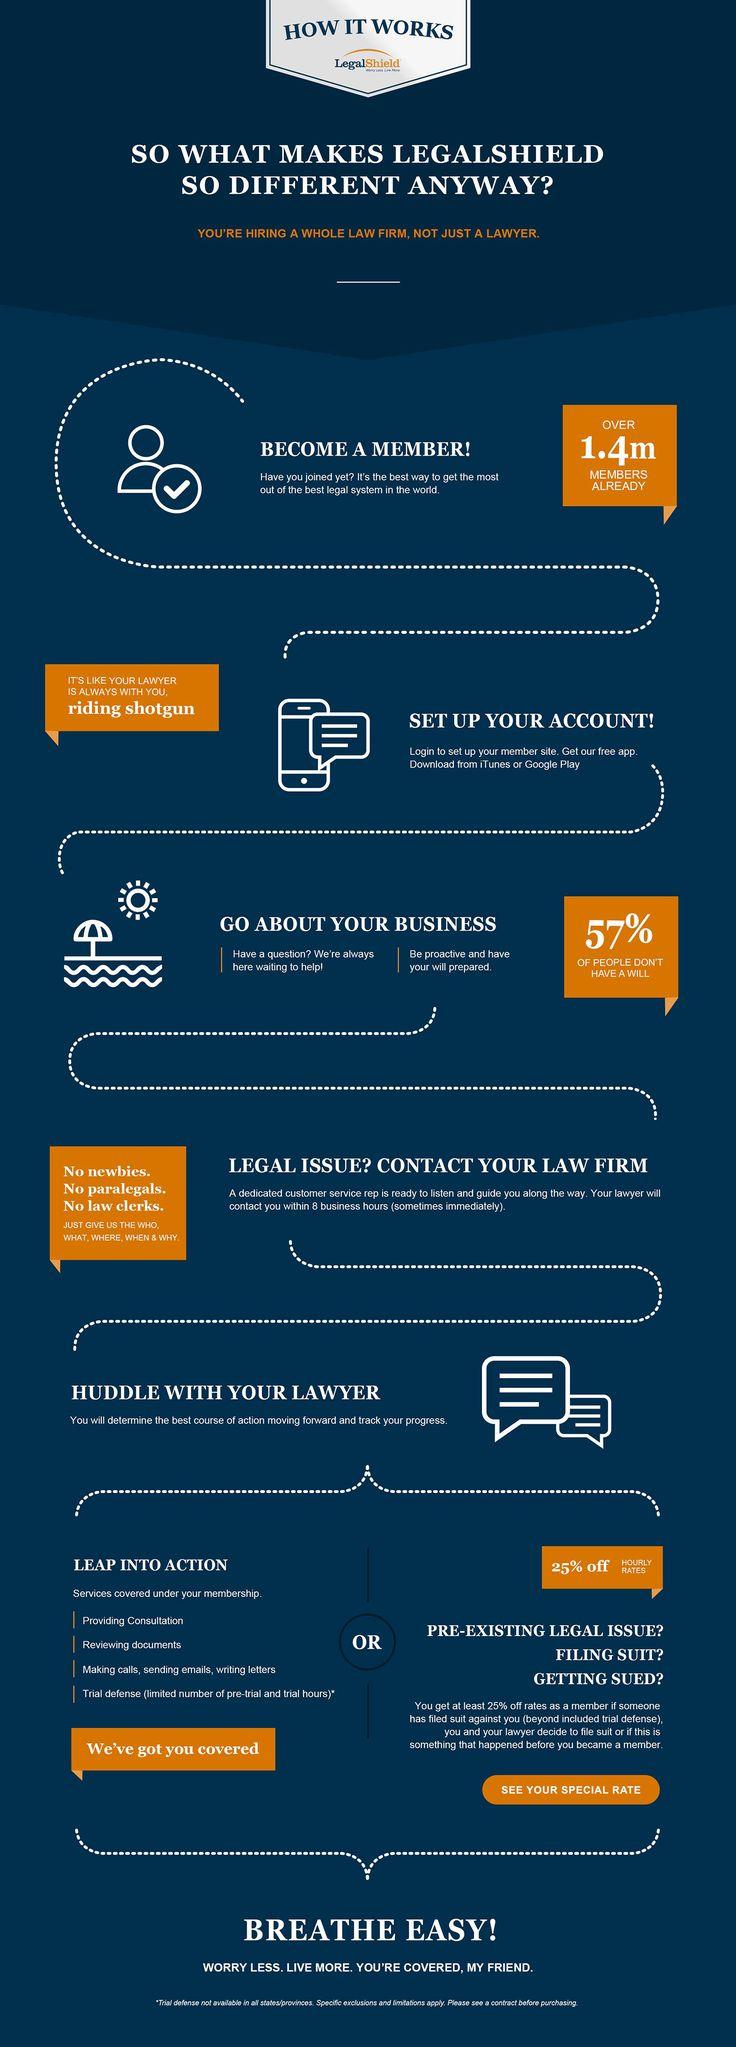 Legalshield Legal Plan For Network Marketers Http Networkmarketer